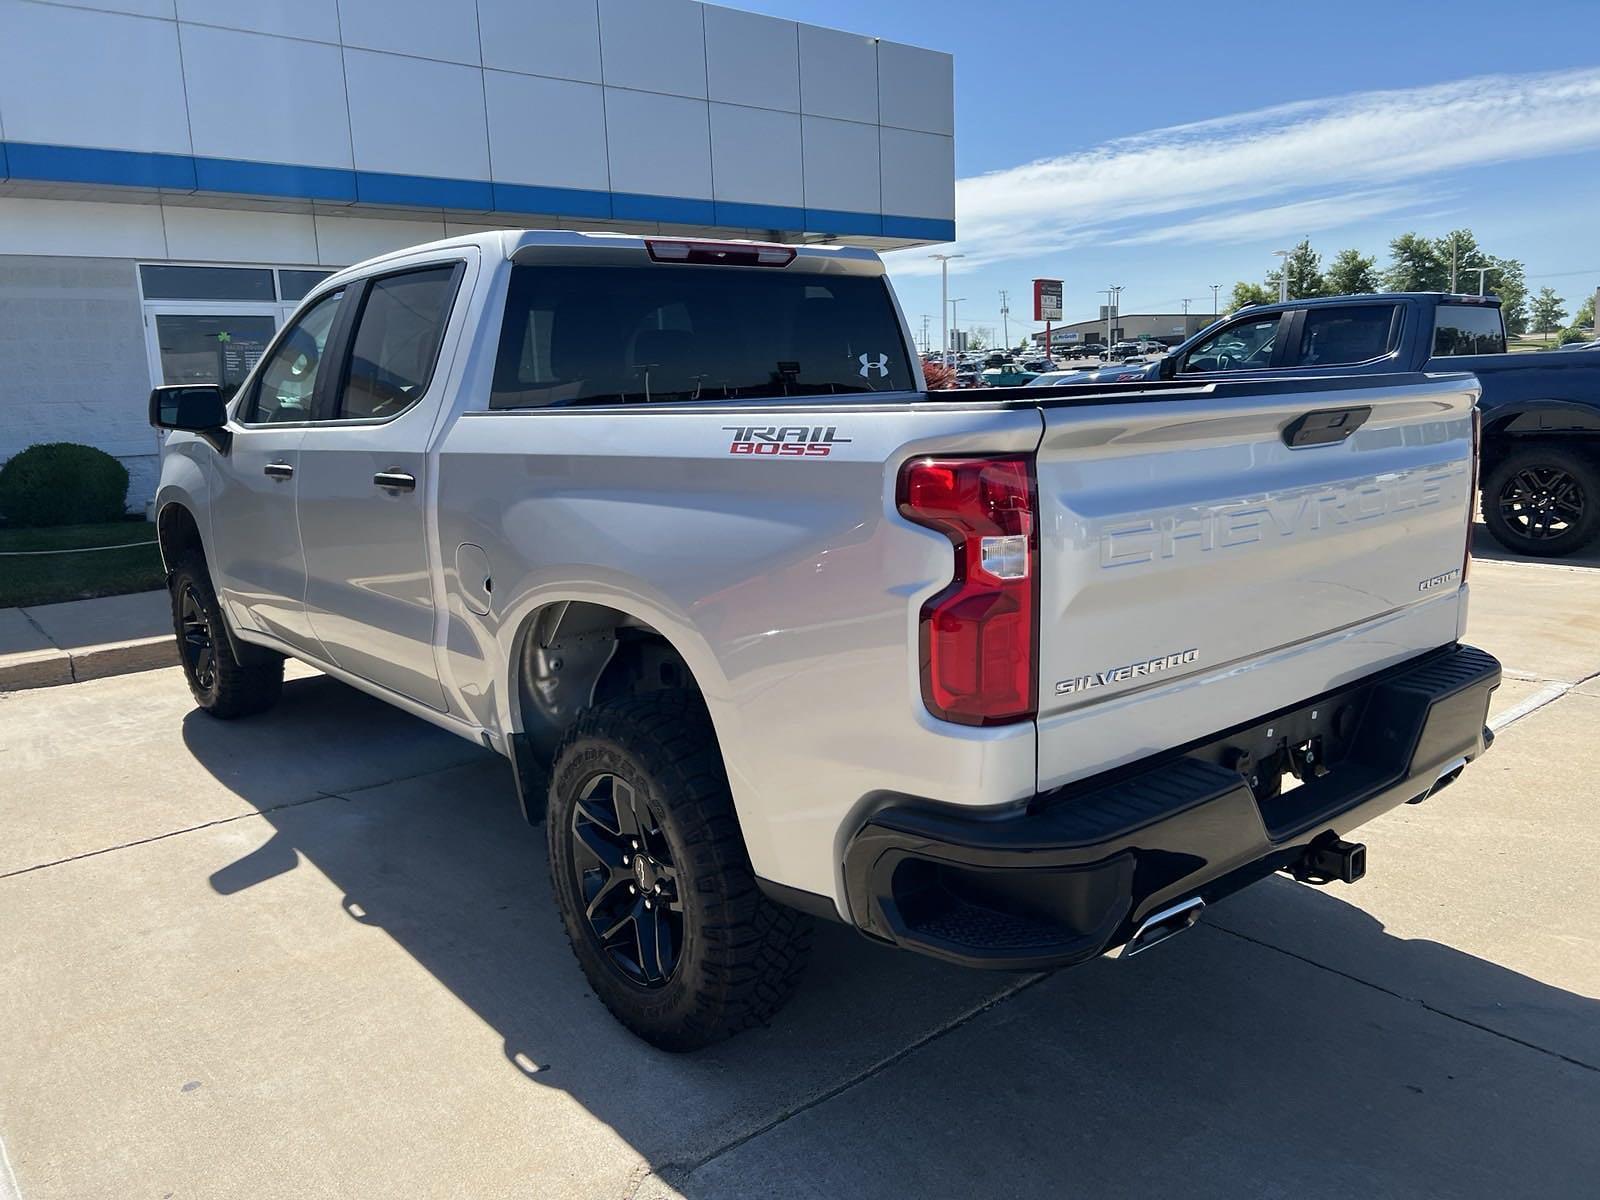 2020 Chevrolet Silverado 1500 Crew Cab 4x4, Pickup #C201626 - photo 4